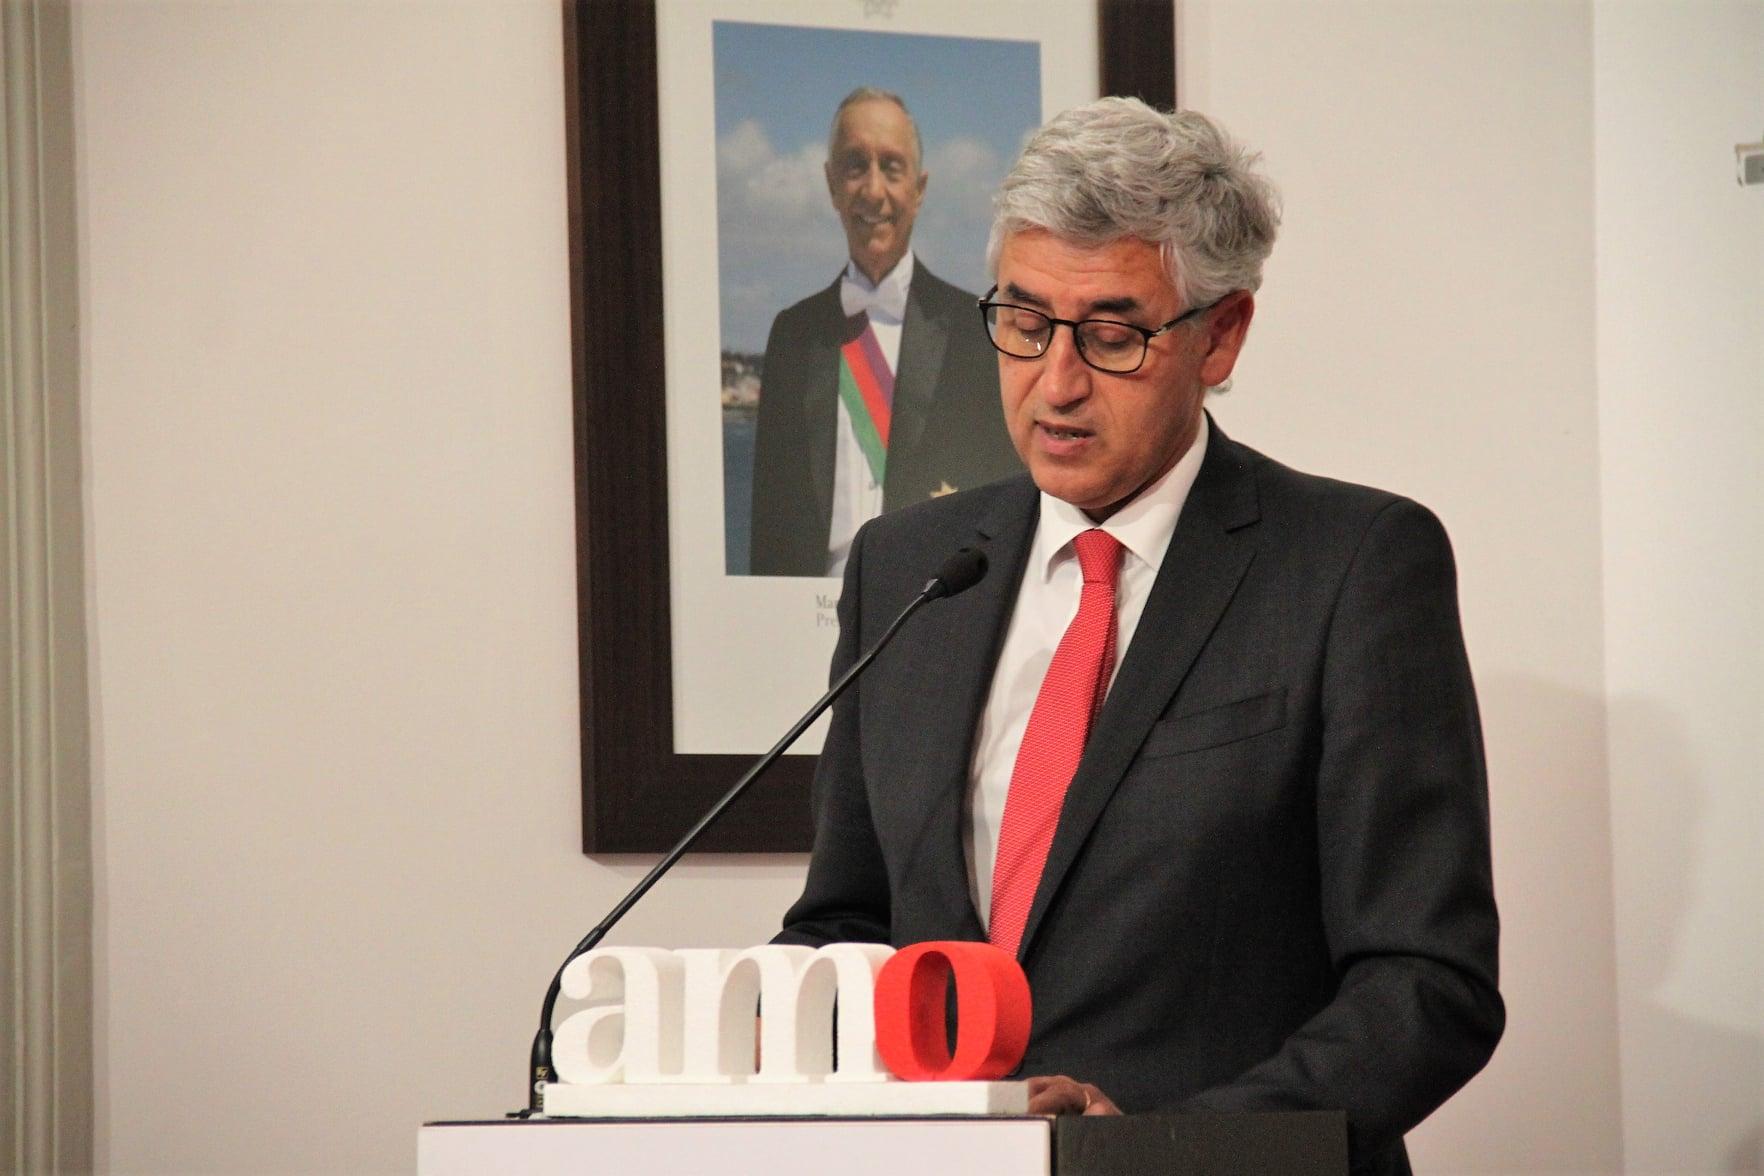 Presidente Camara Ourém